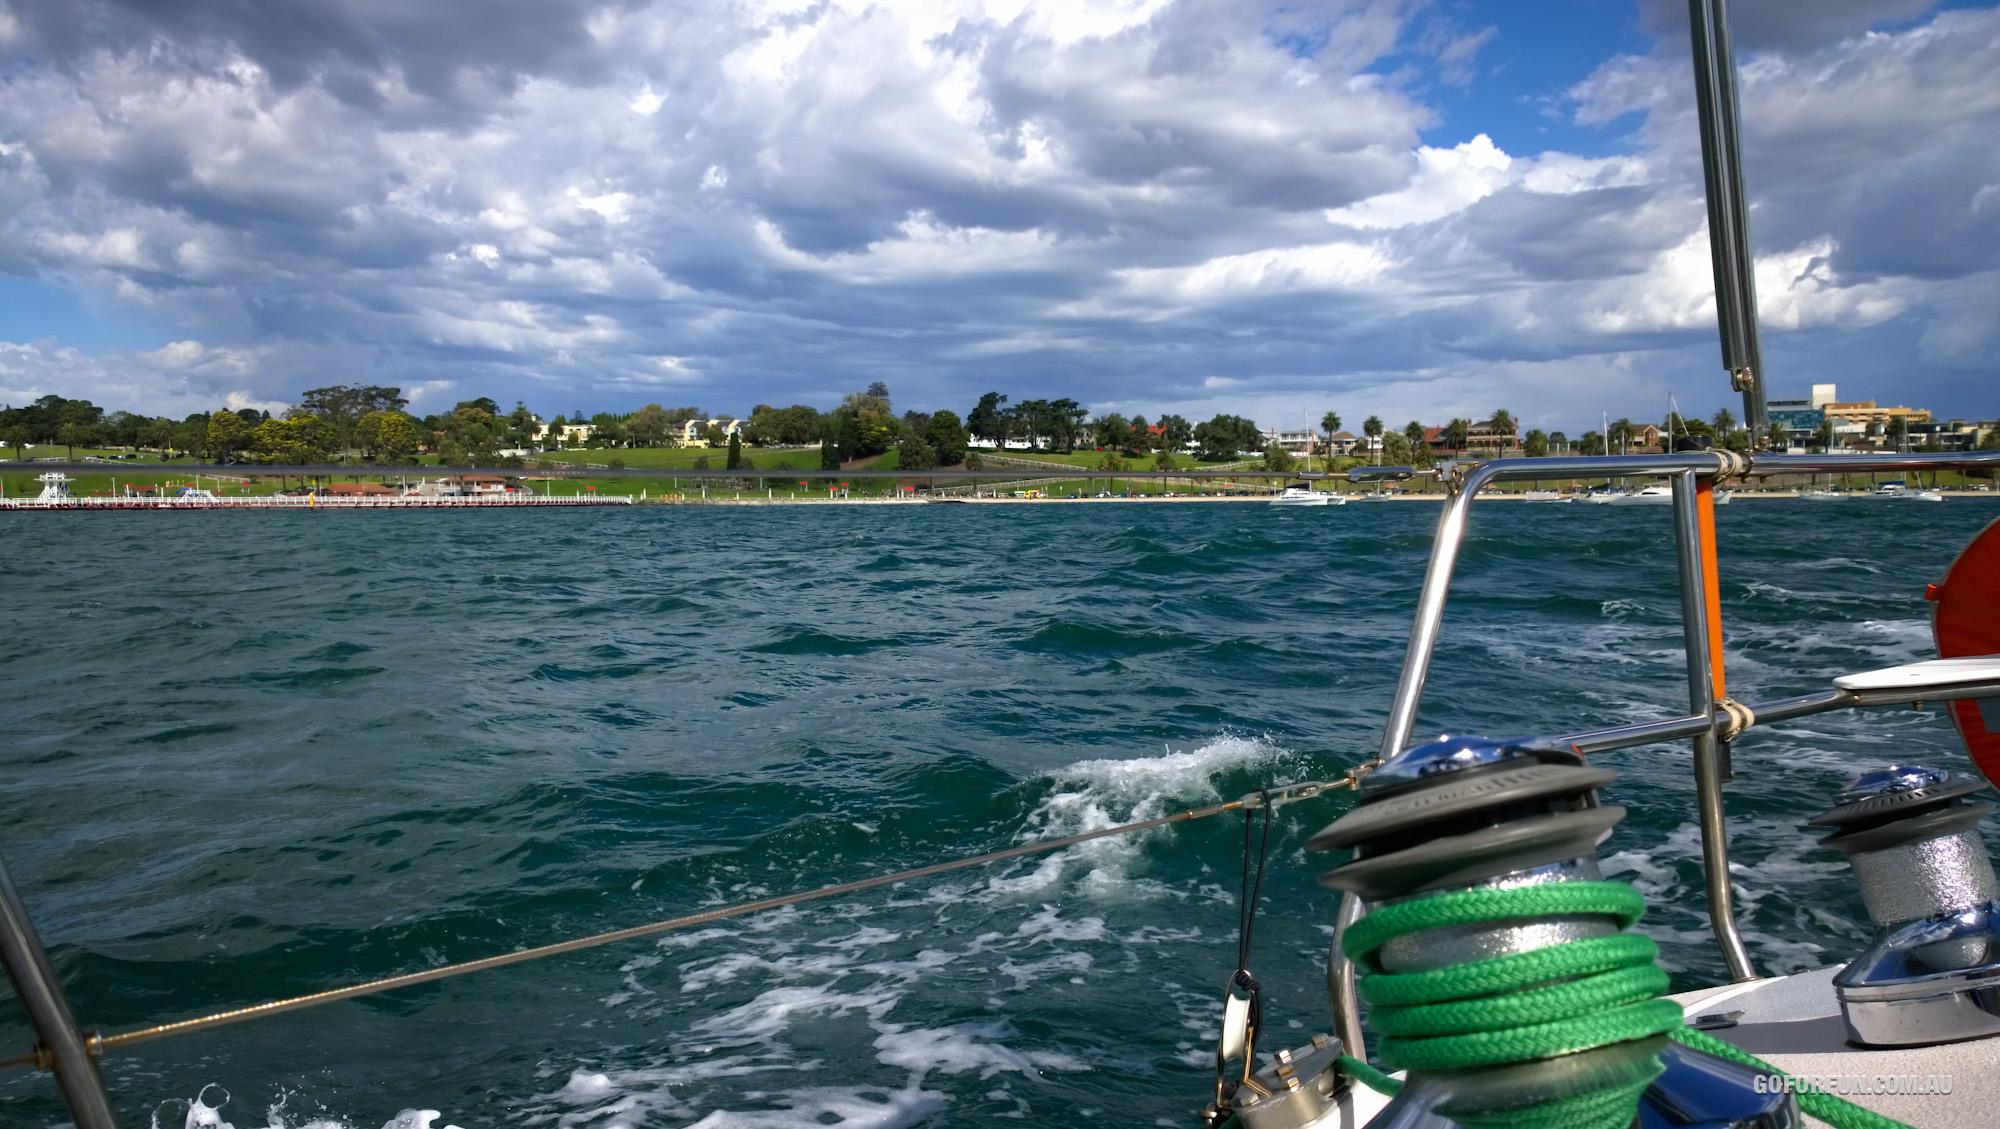 WP_20170408_13_27_13_Pro__highres_royal-geelong-yacht-club-sailing-sailboat-yacht-racing-australia-corio-bay-melbourne-victoria